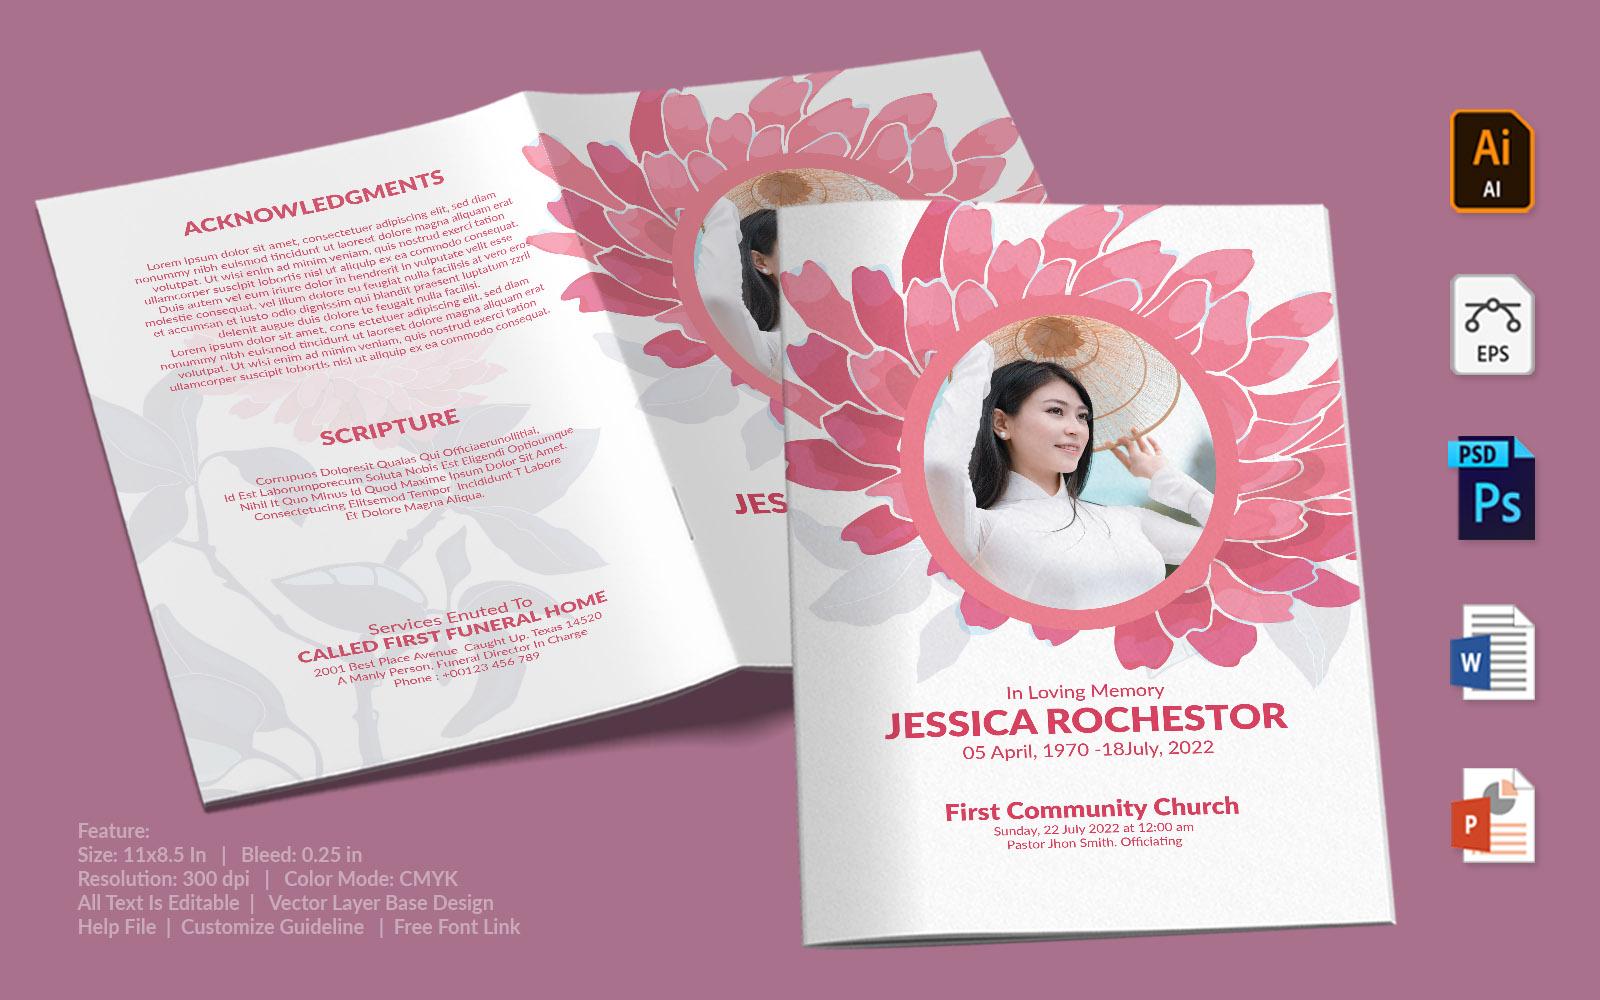 Printable Funeral Program - Illustrated Pink Flower Theme